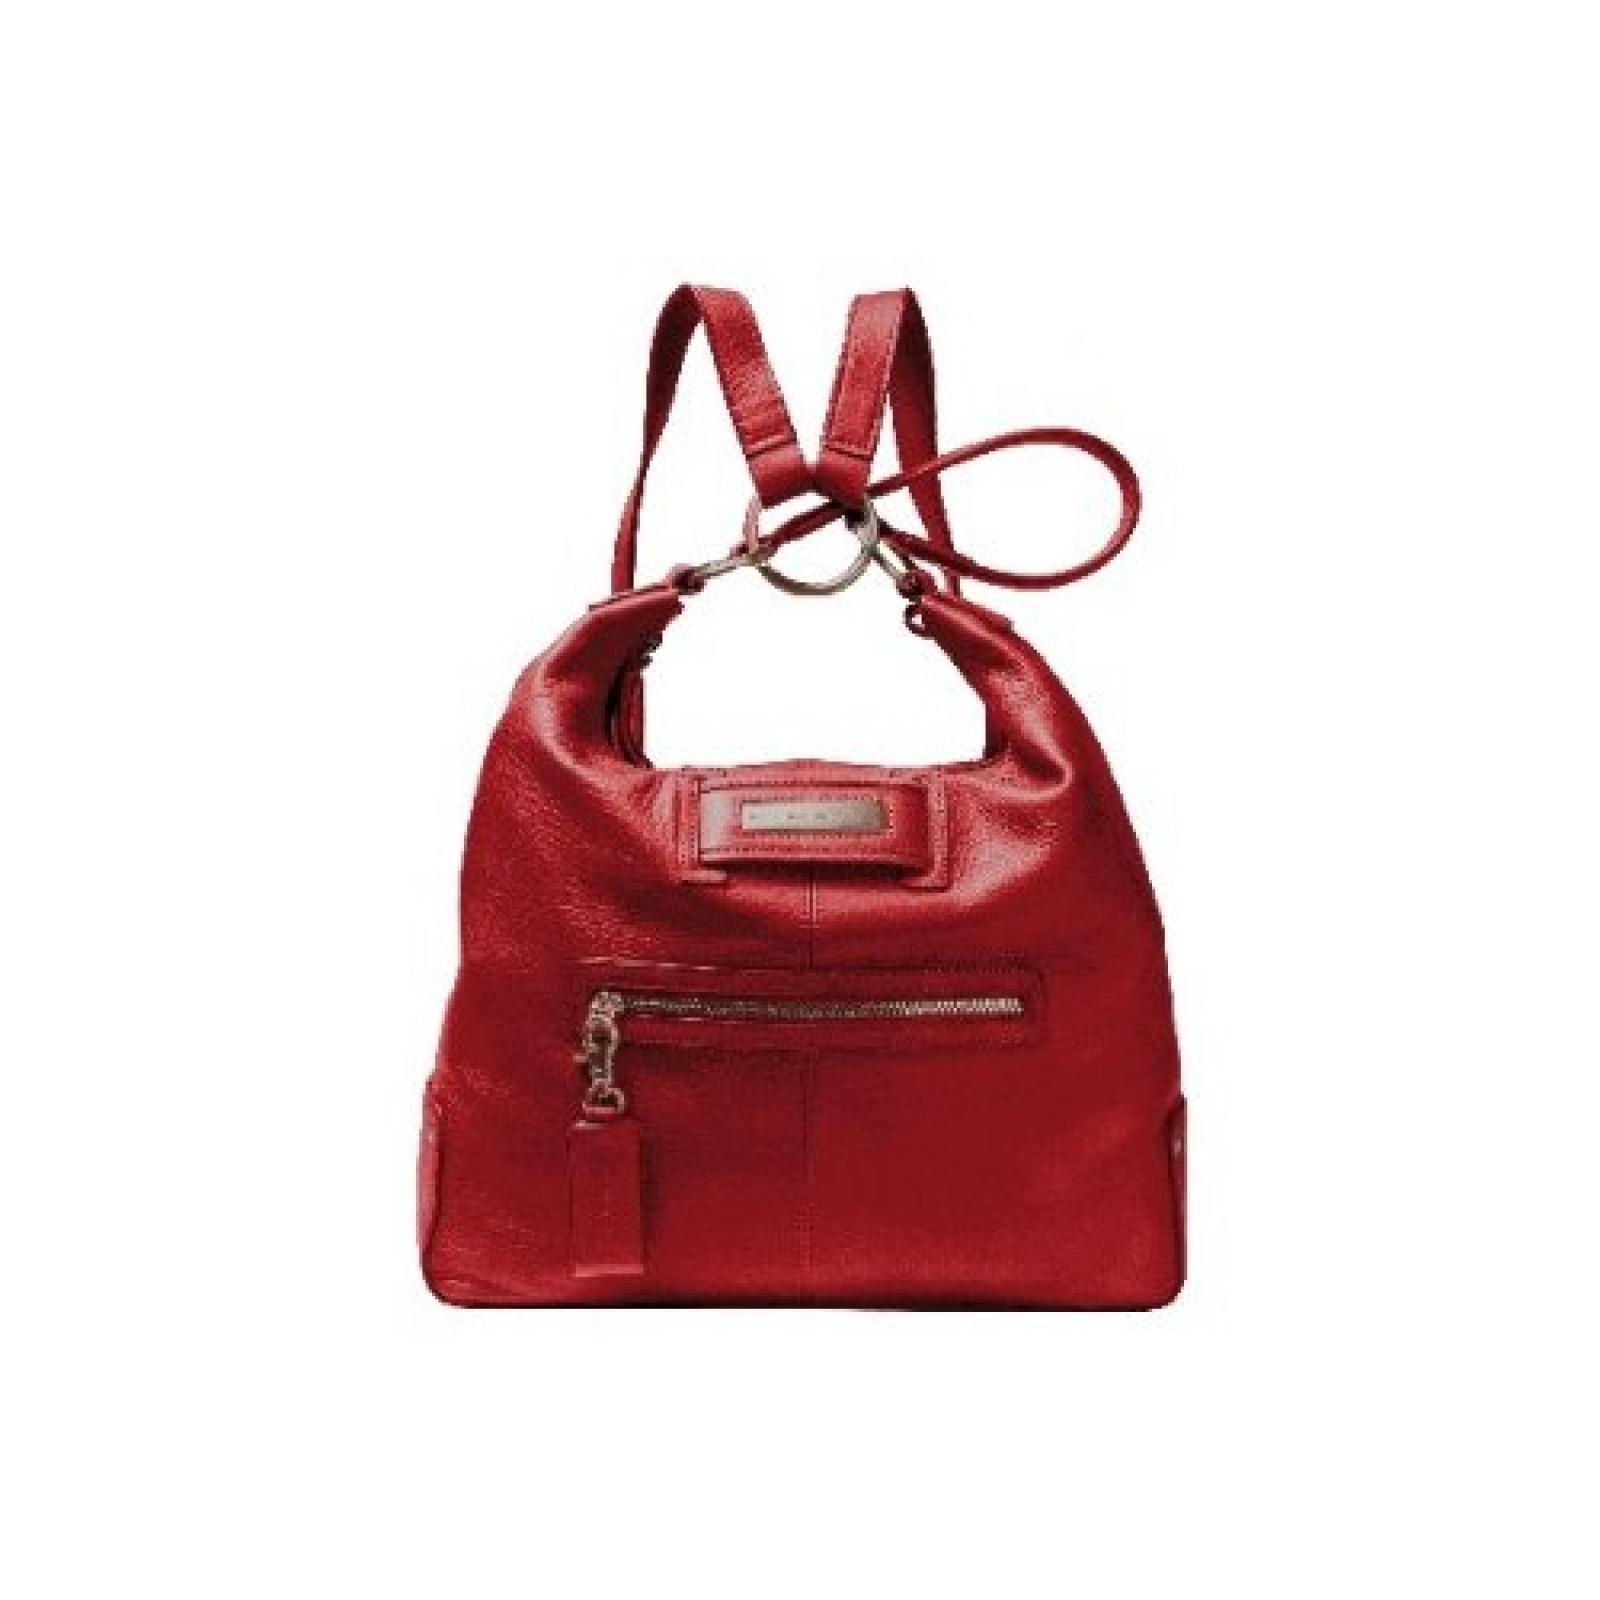 Piquadro Schultertasche aus Leder rot Shimmer BD2238S31/RO